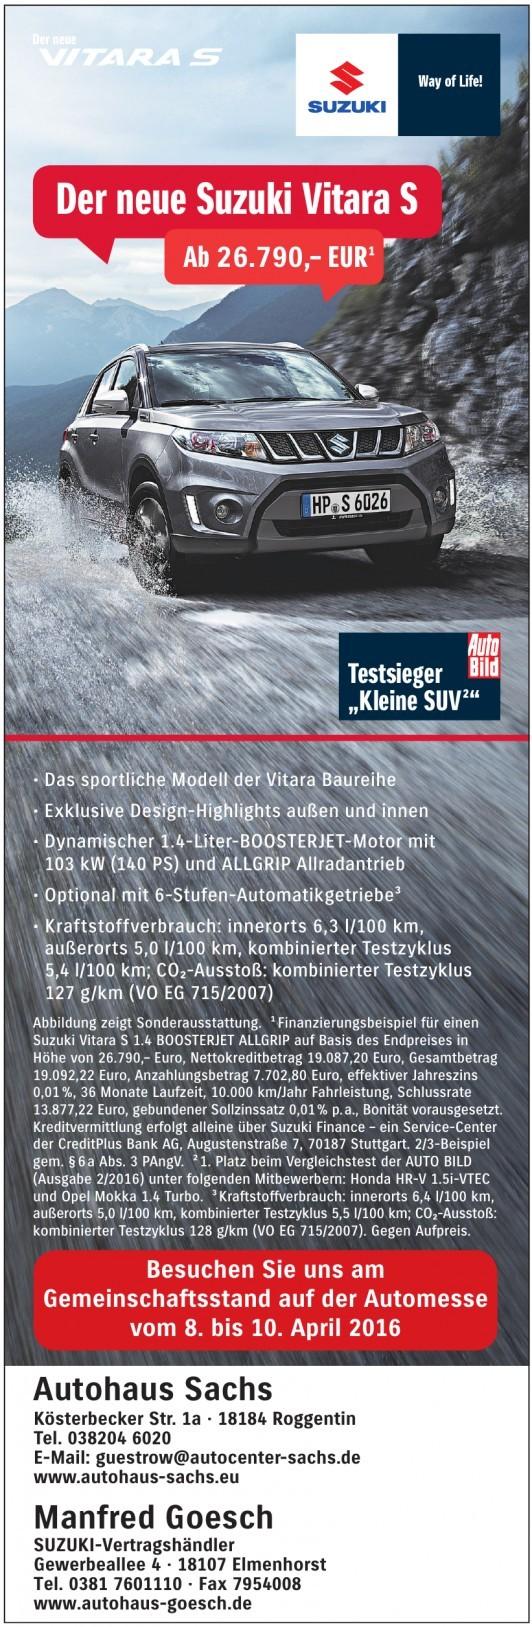 Autohaus Sachs